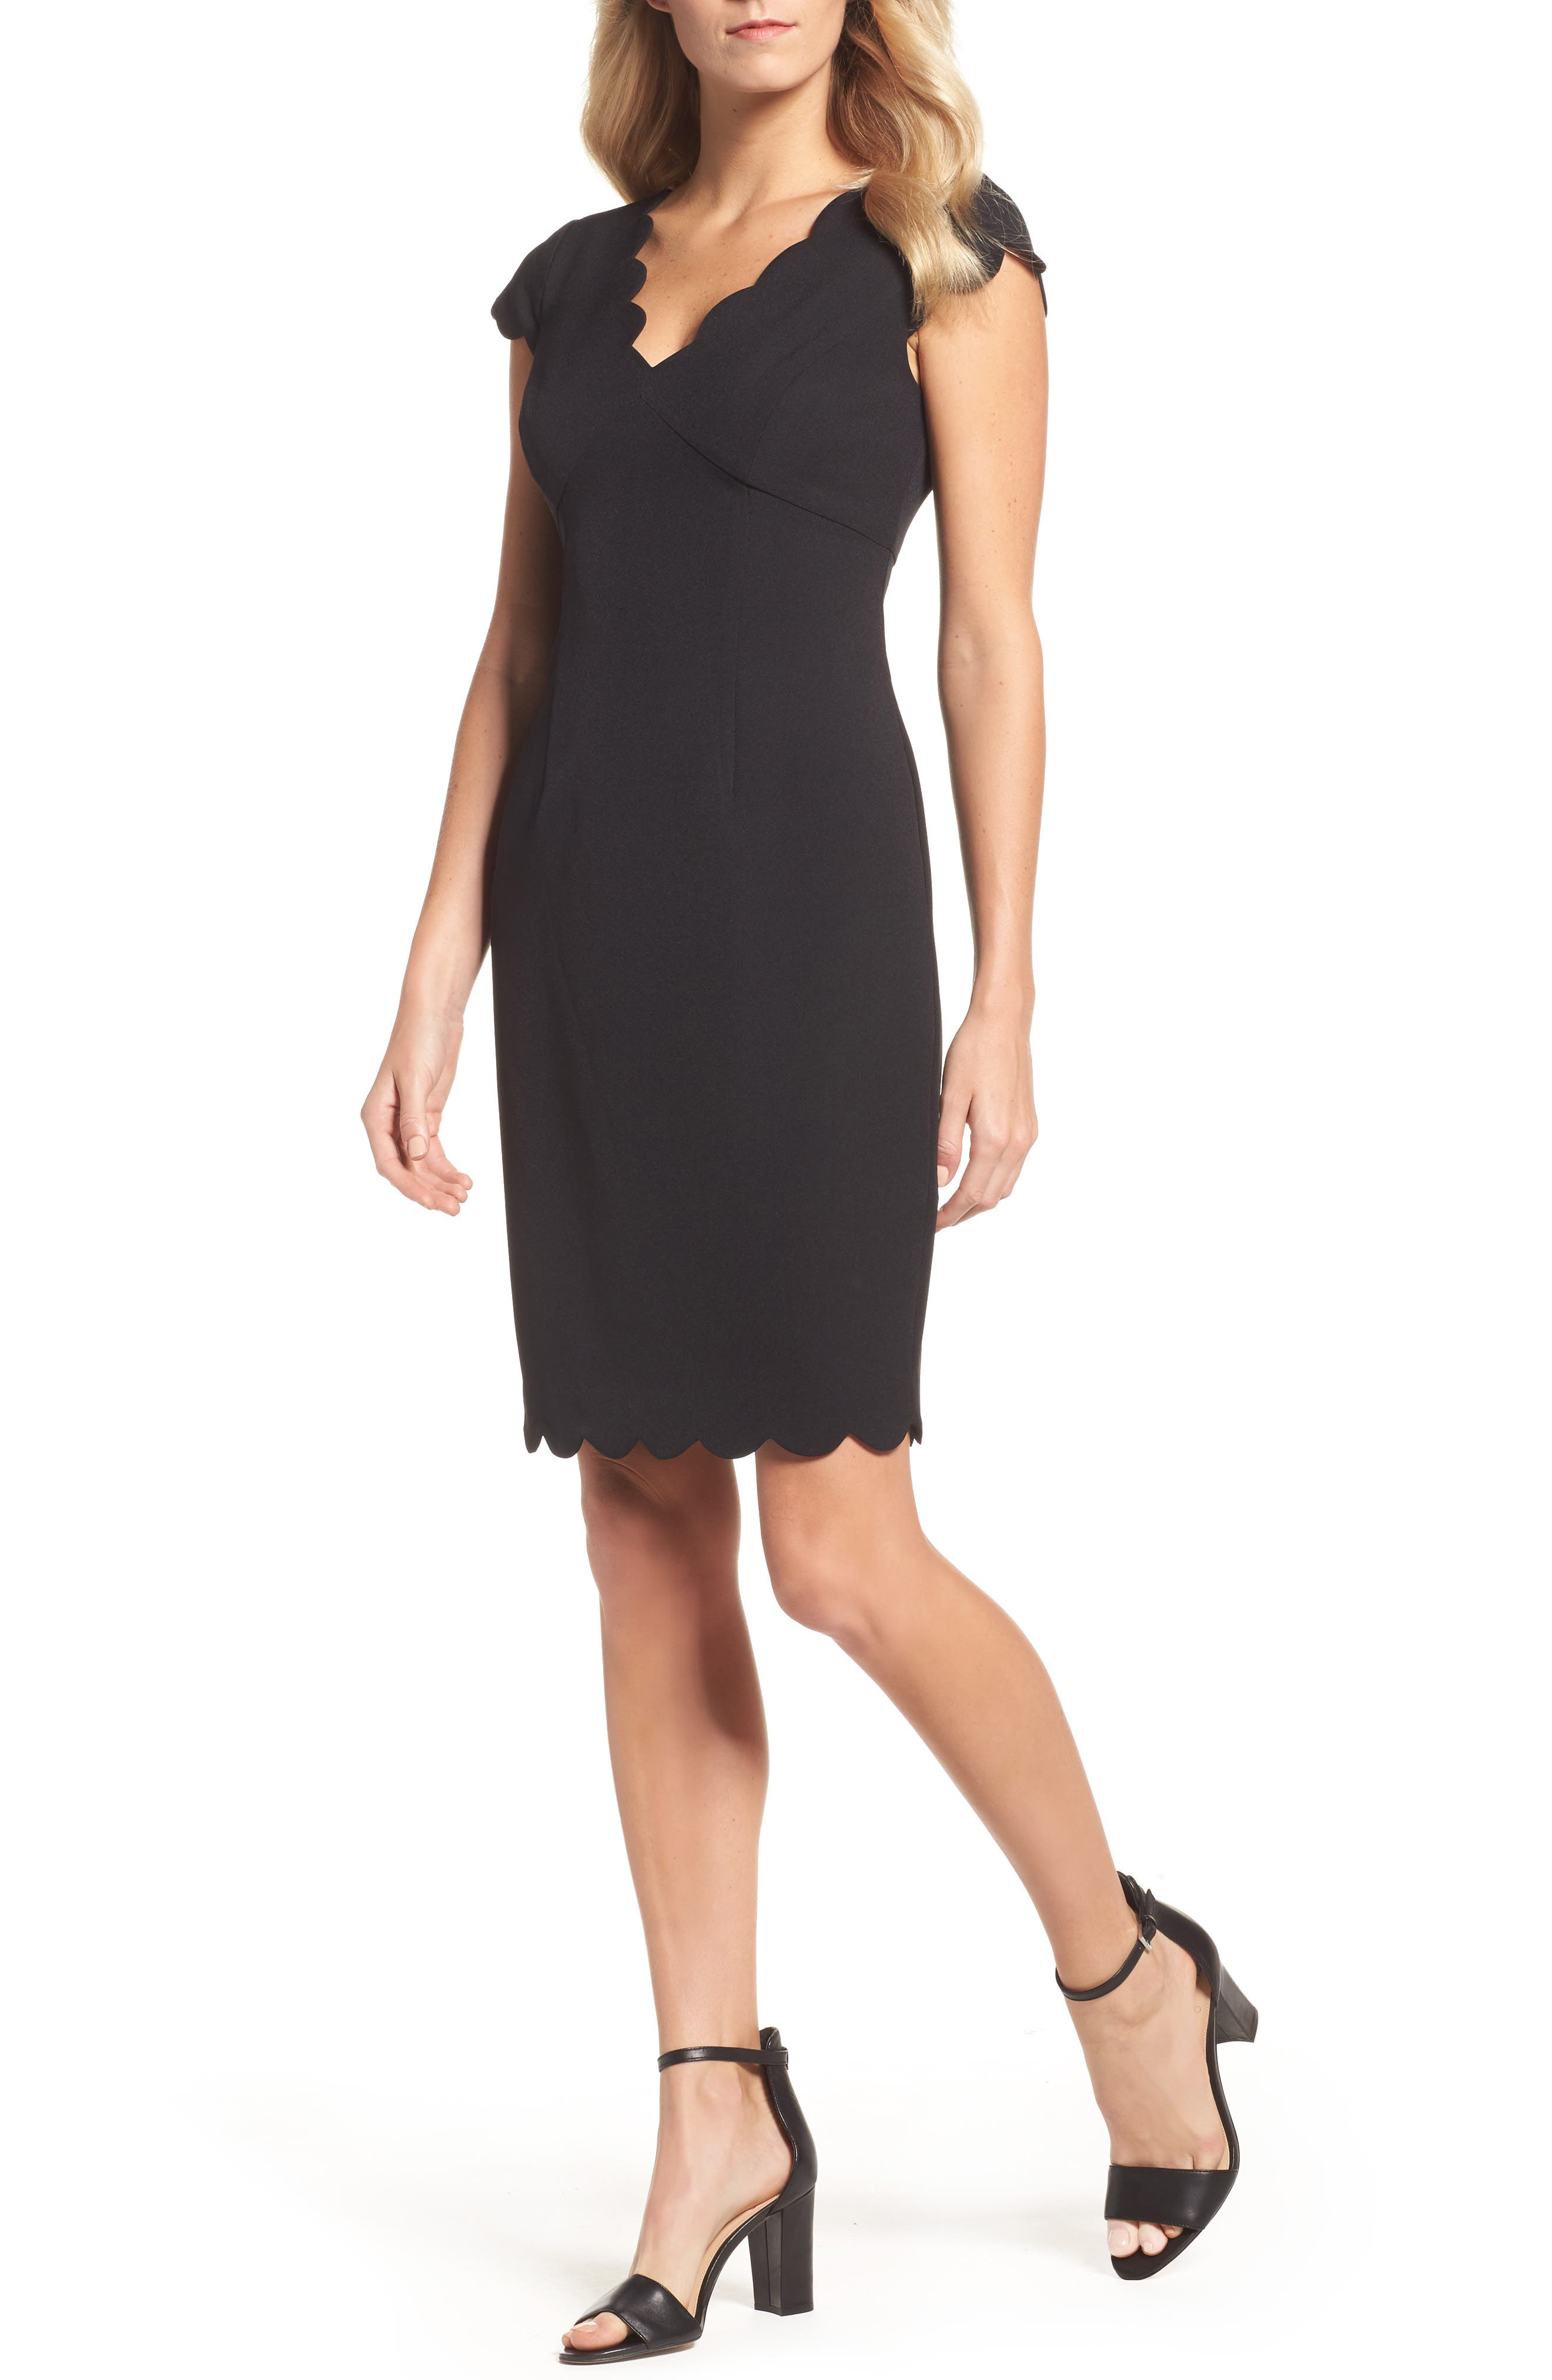 ADRIANNA PAPELL Scalloped Crepe Sheath Dress, Main, color, 001